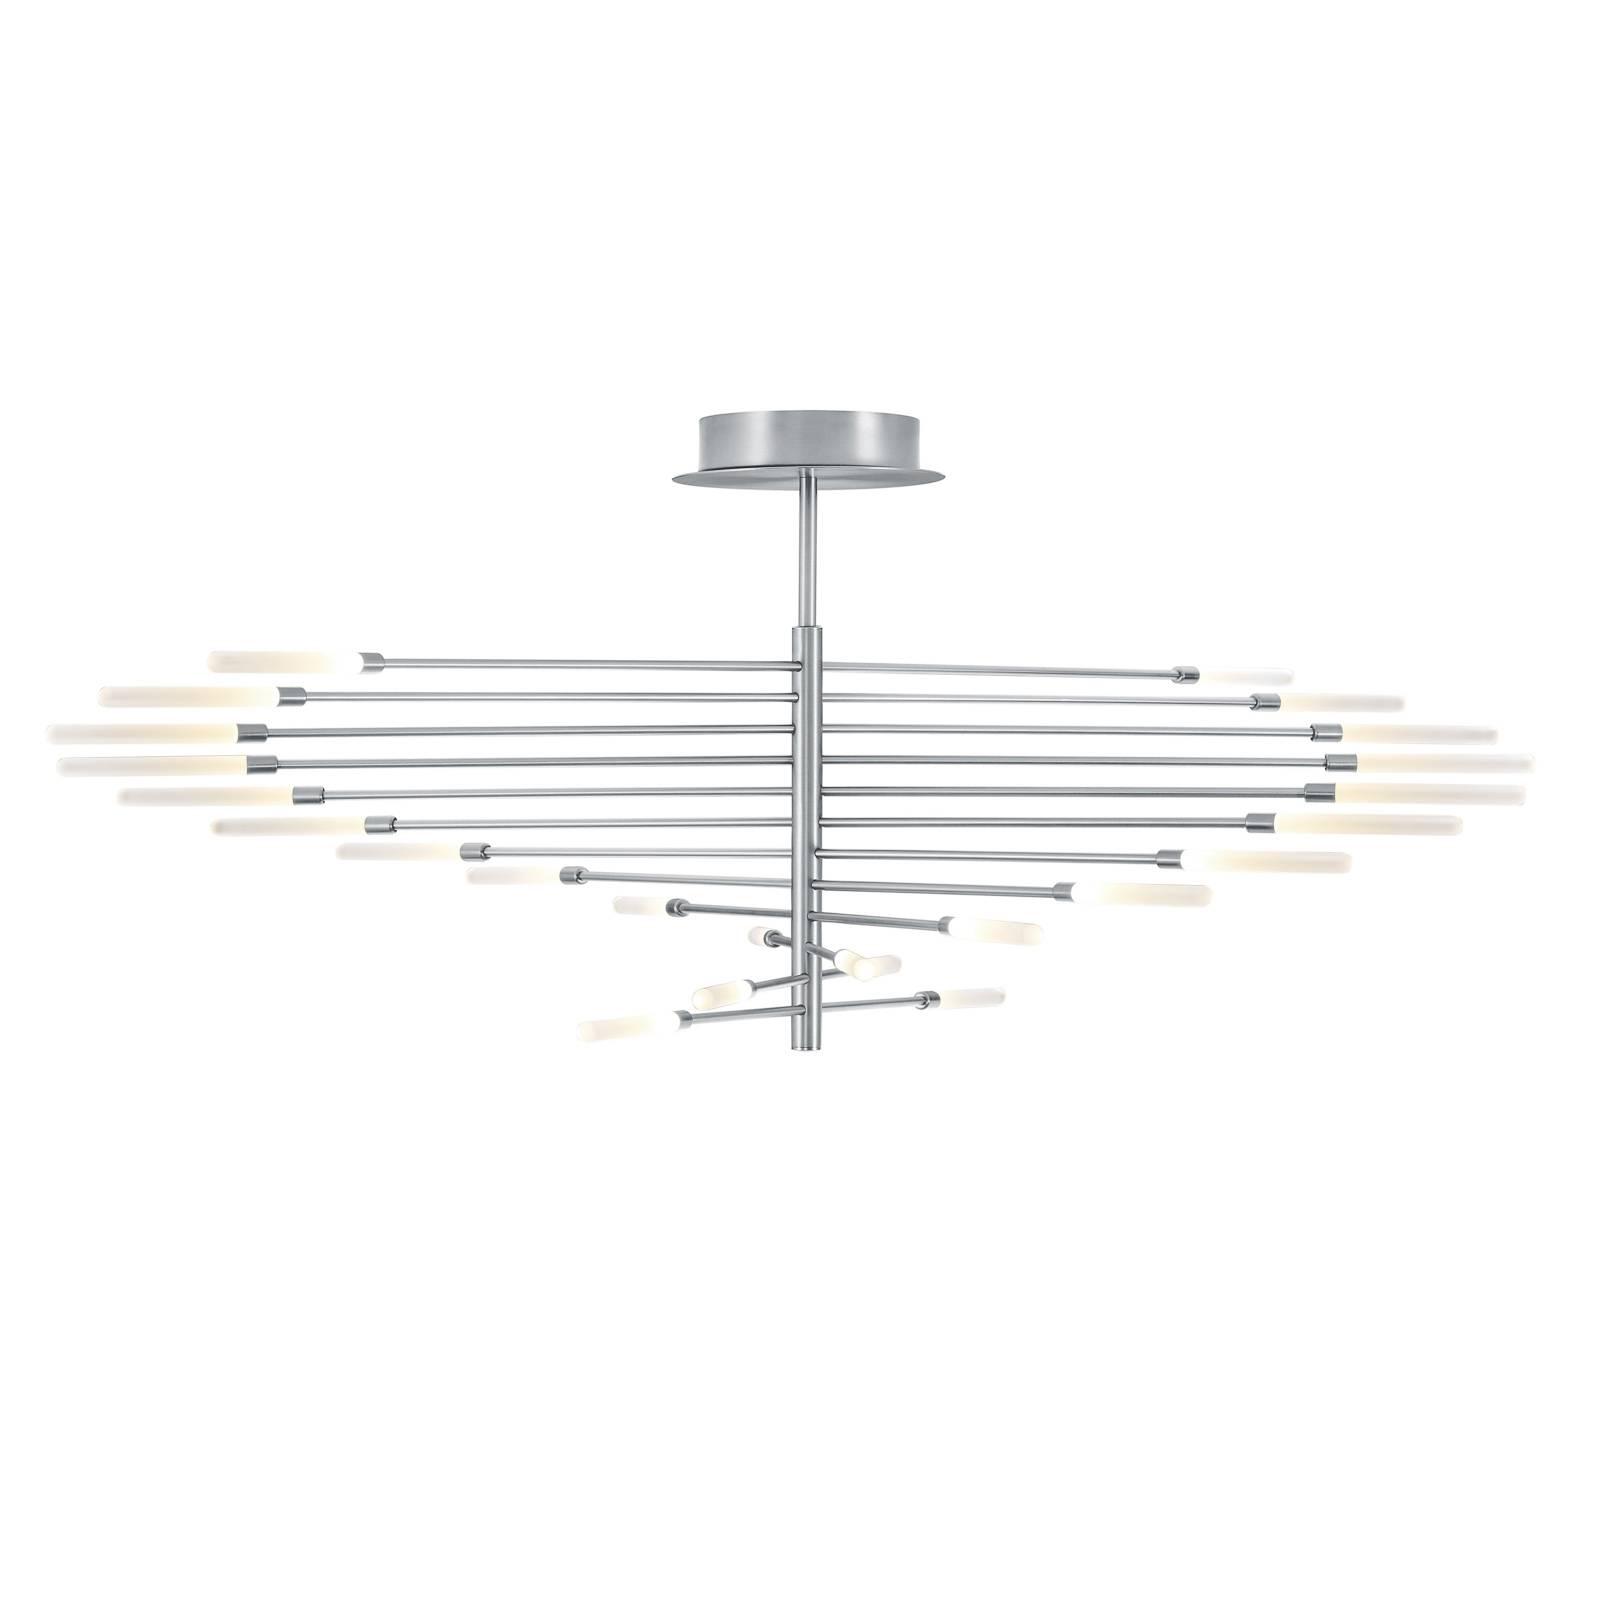 BANKAMP Lola lampa sufitowa LED 24-pkt. aluminium